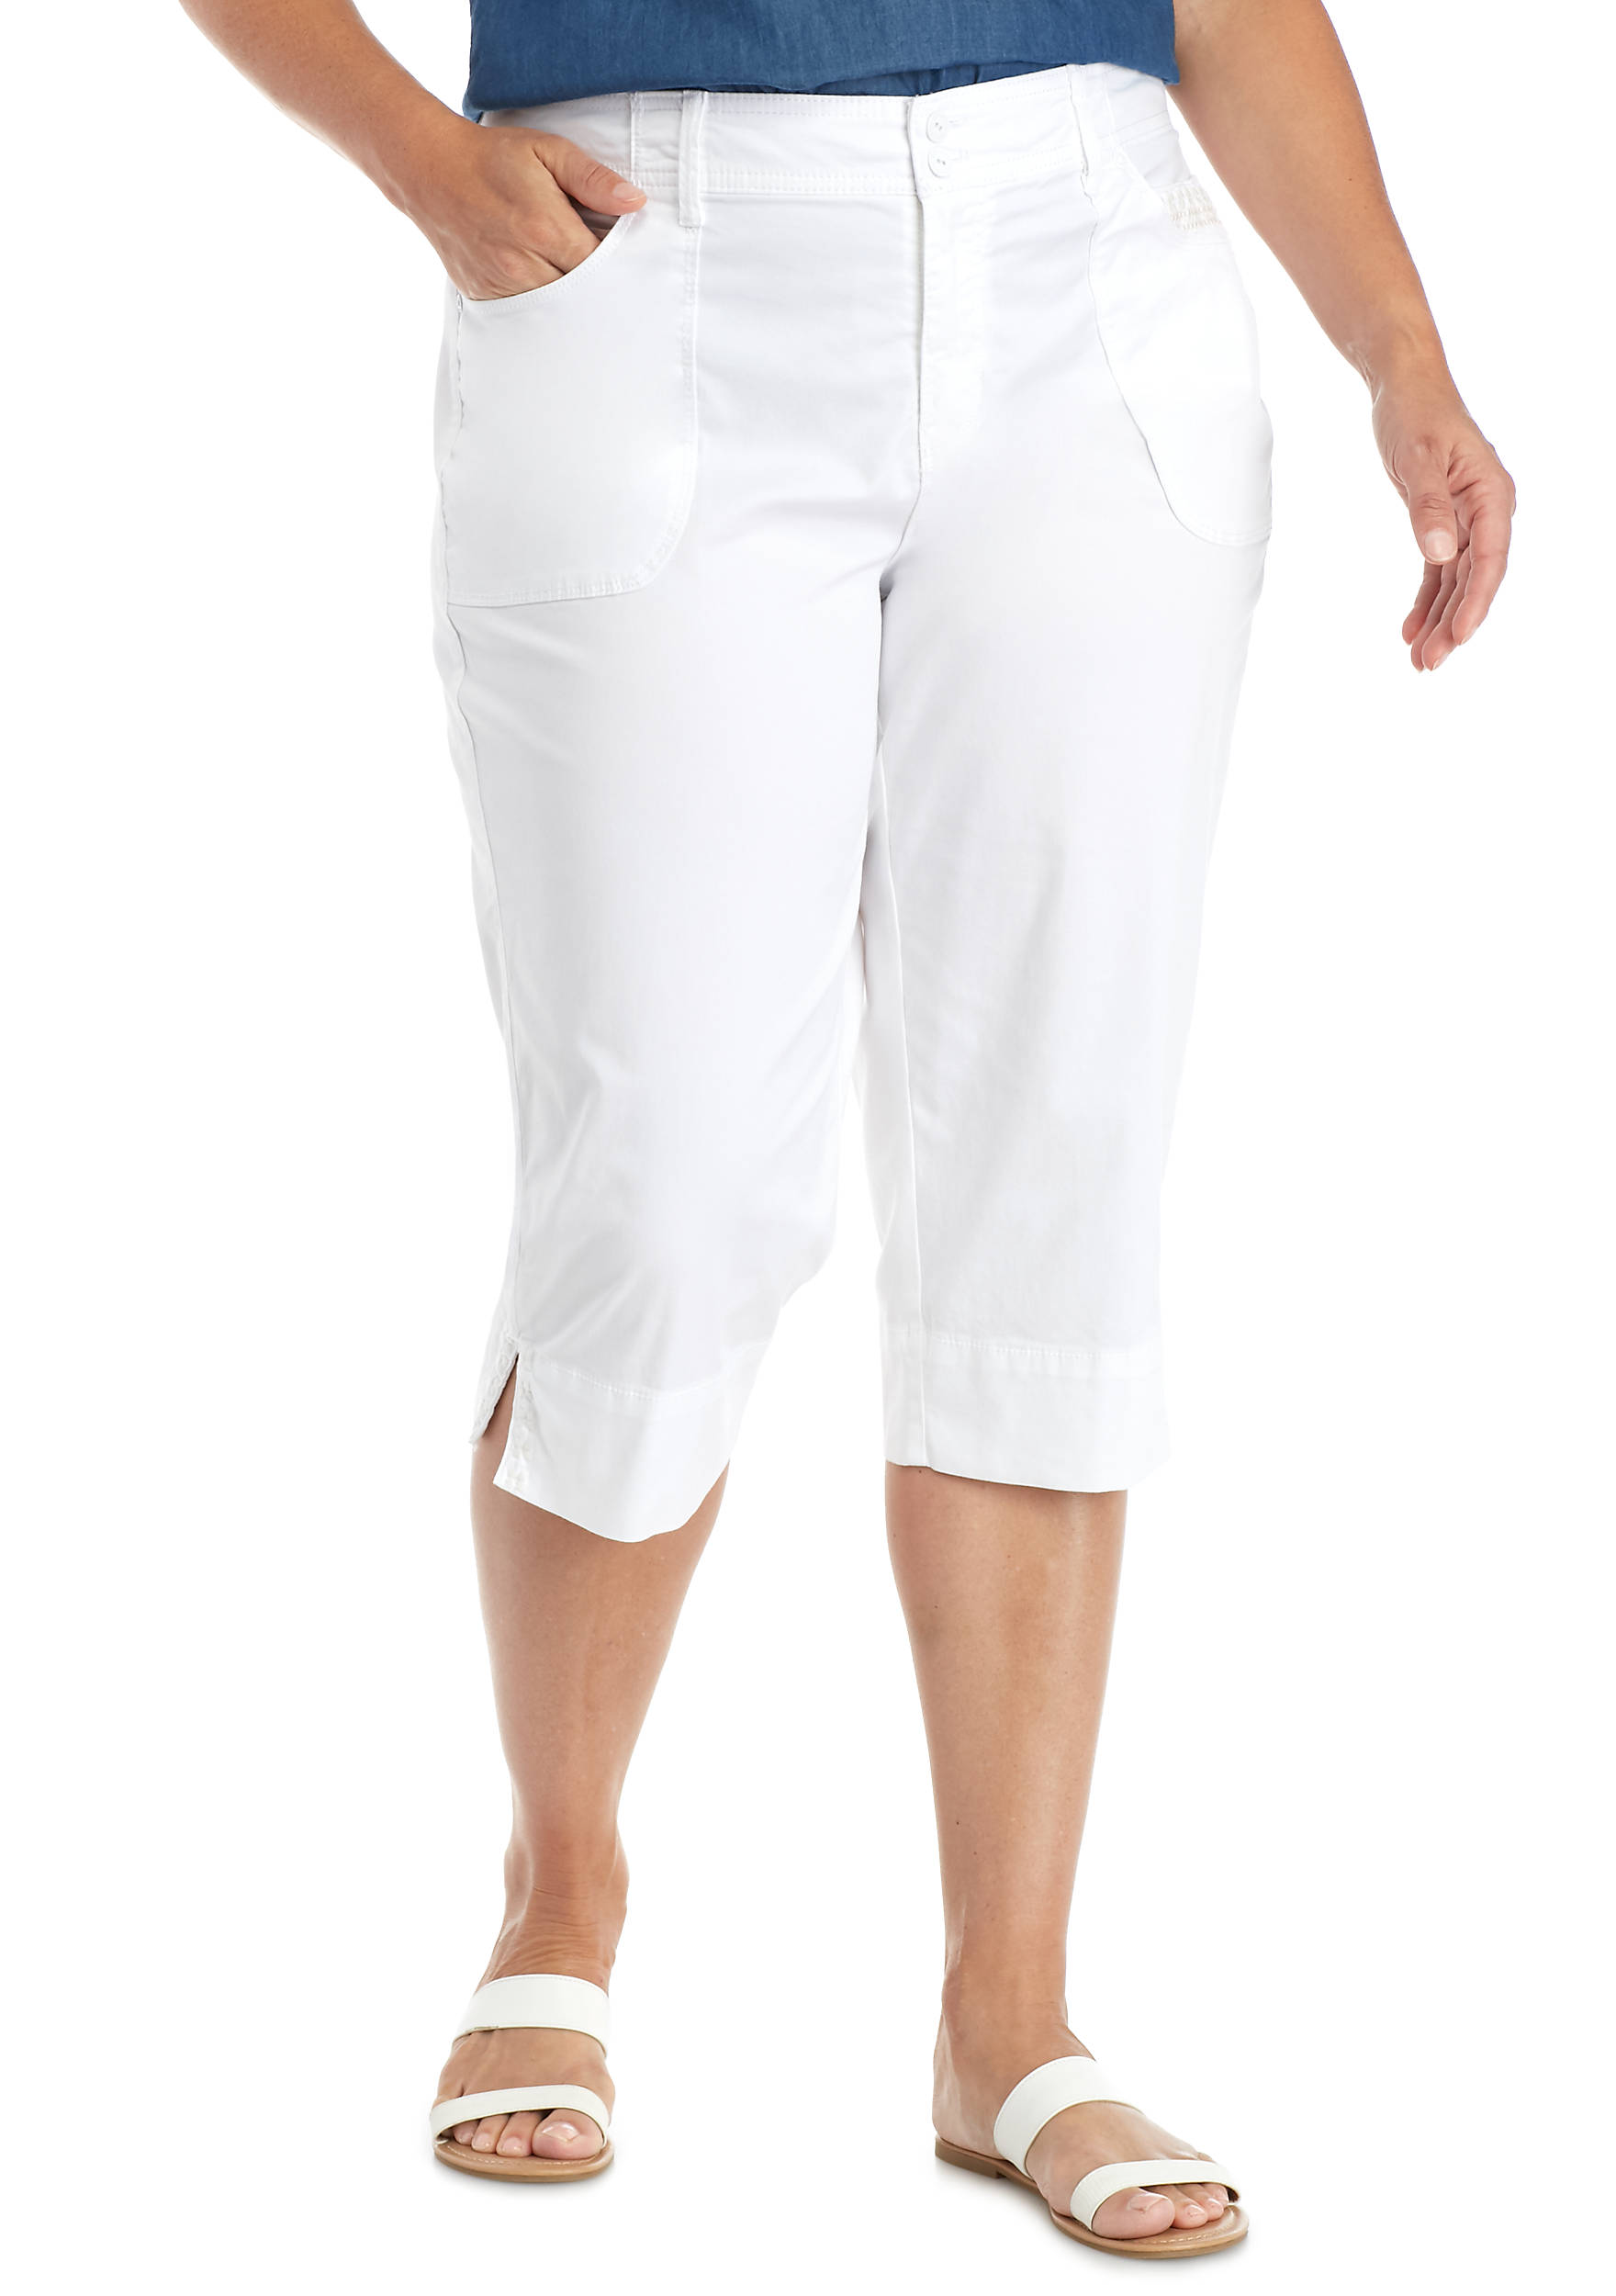 Gloria Vanderbilt Plus Size Alicia Capri Short | belk